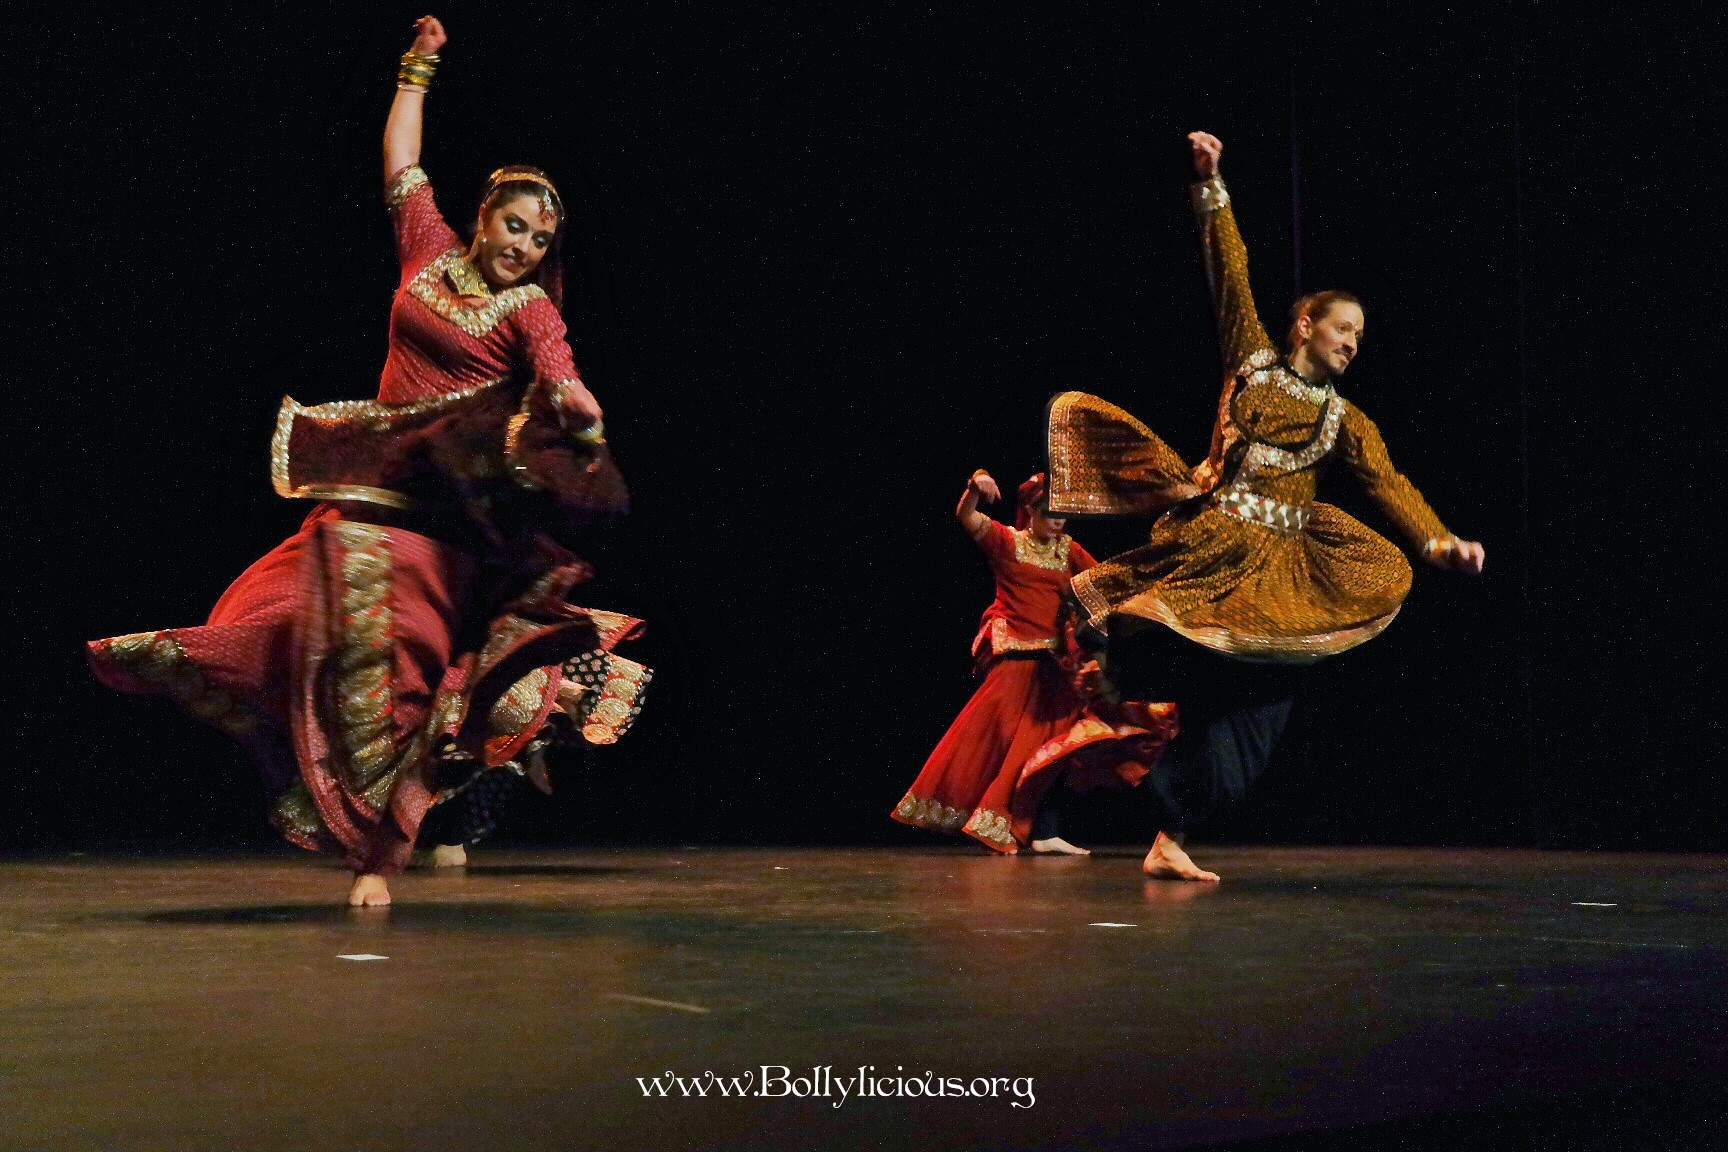 Bollylicious Bollywood Rajasthani Kalbeliya